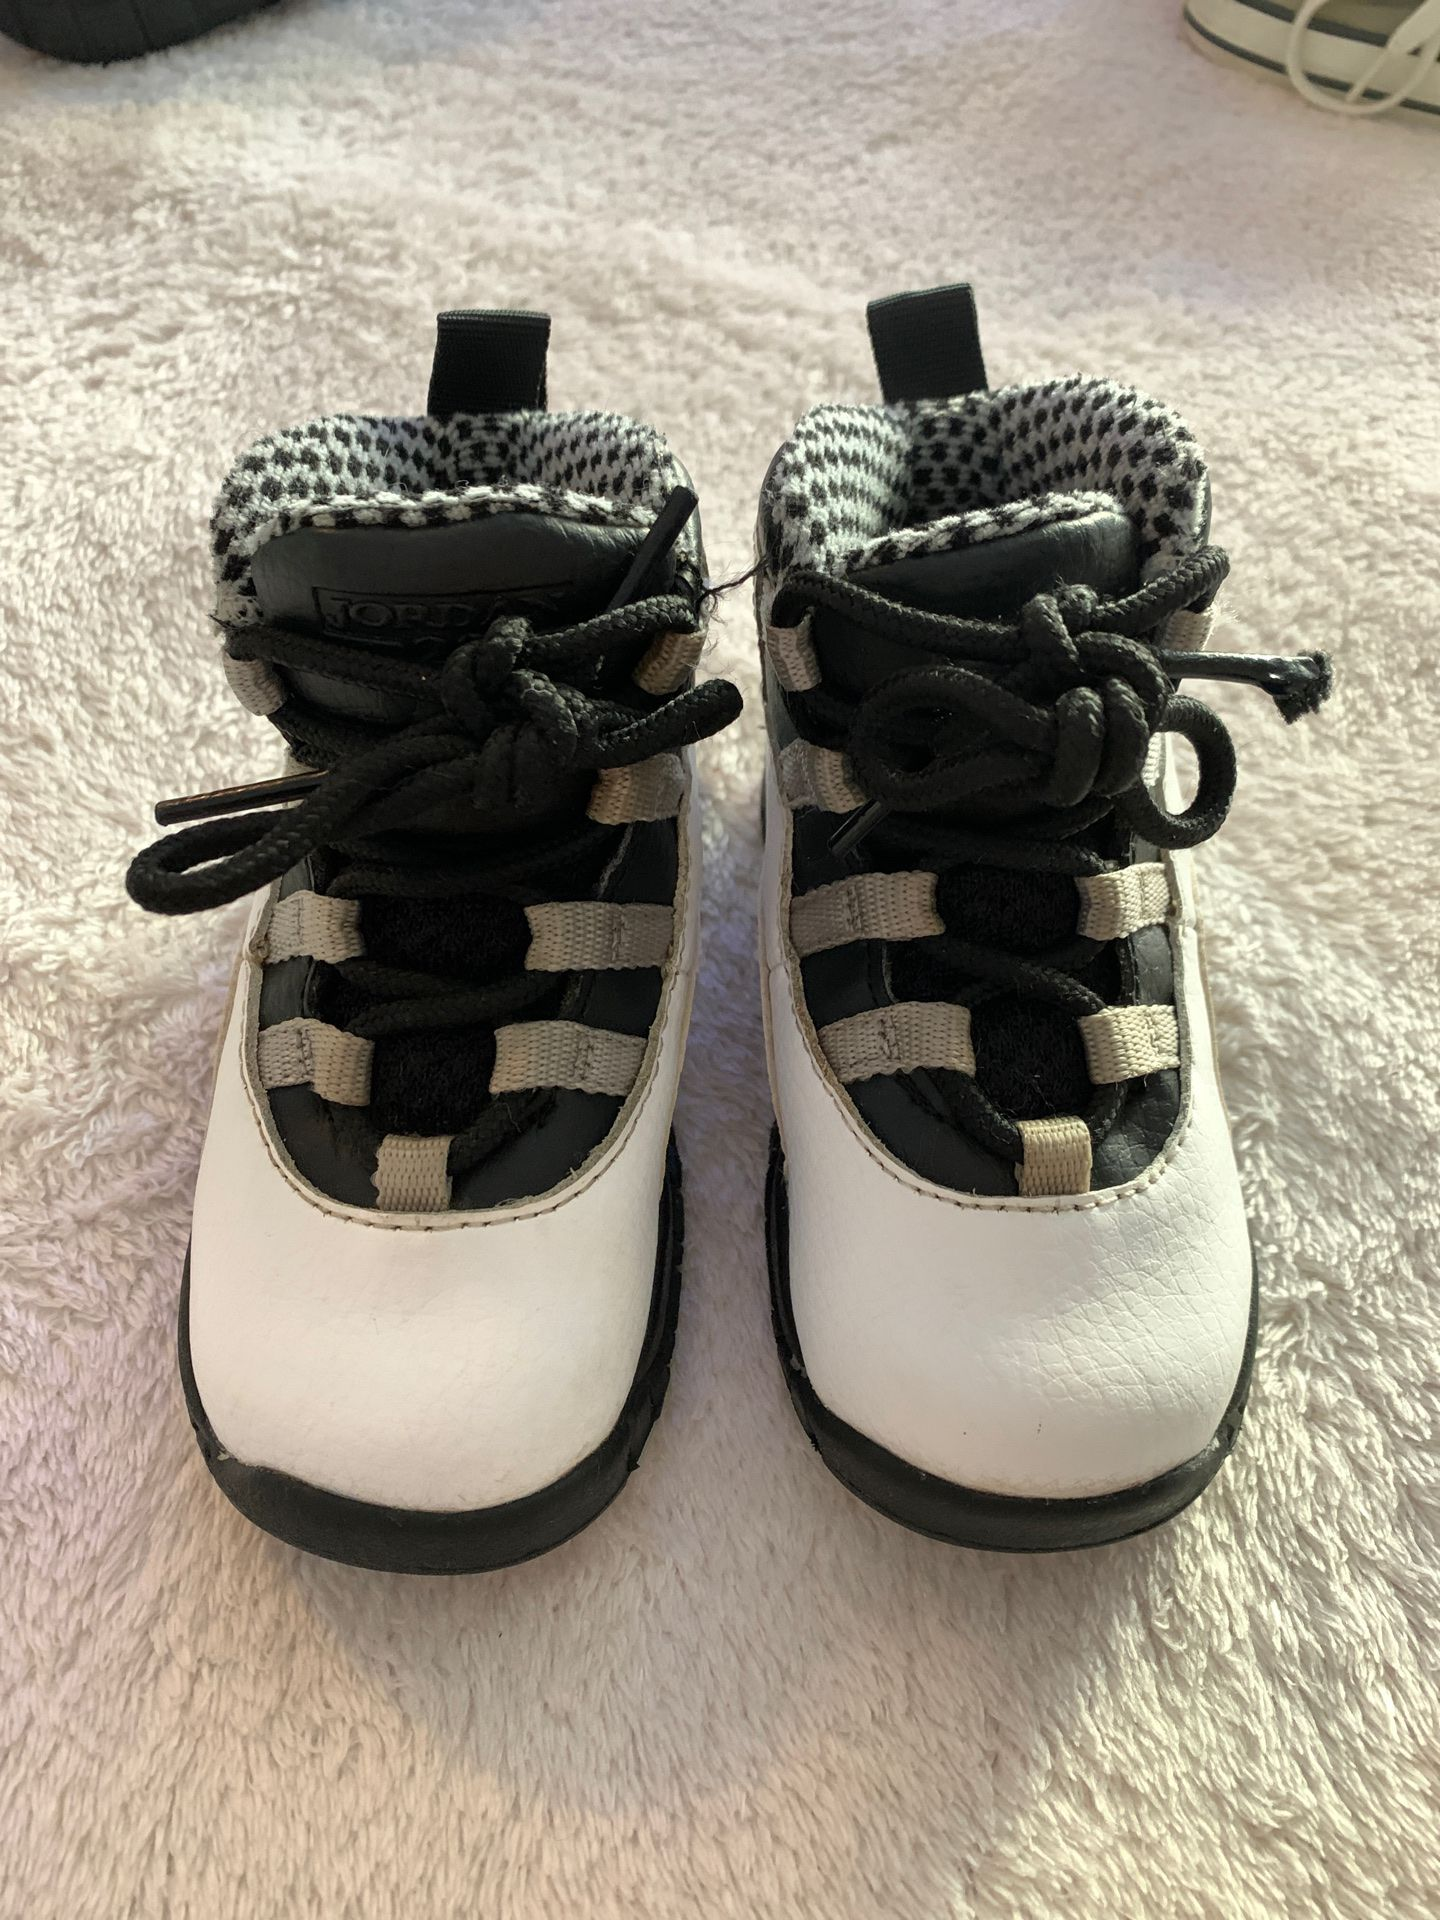 6c Jordan's